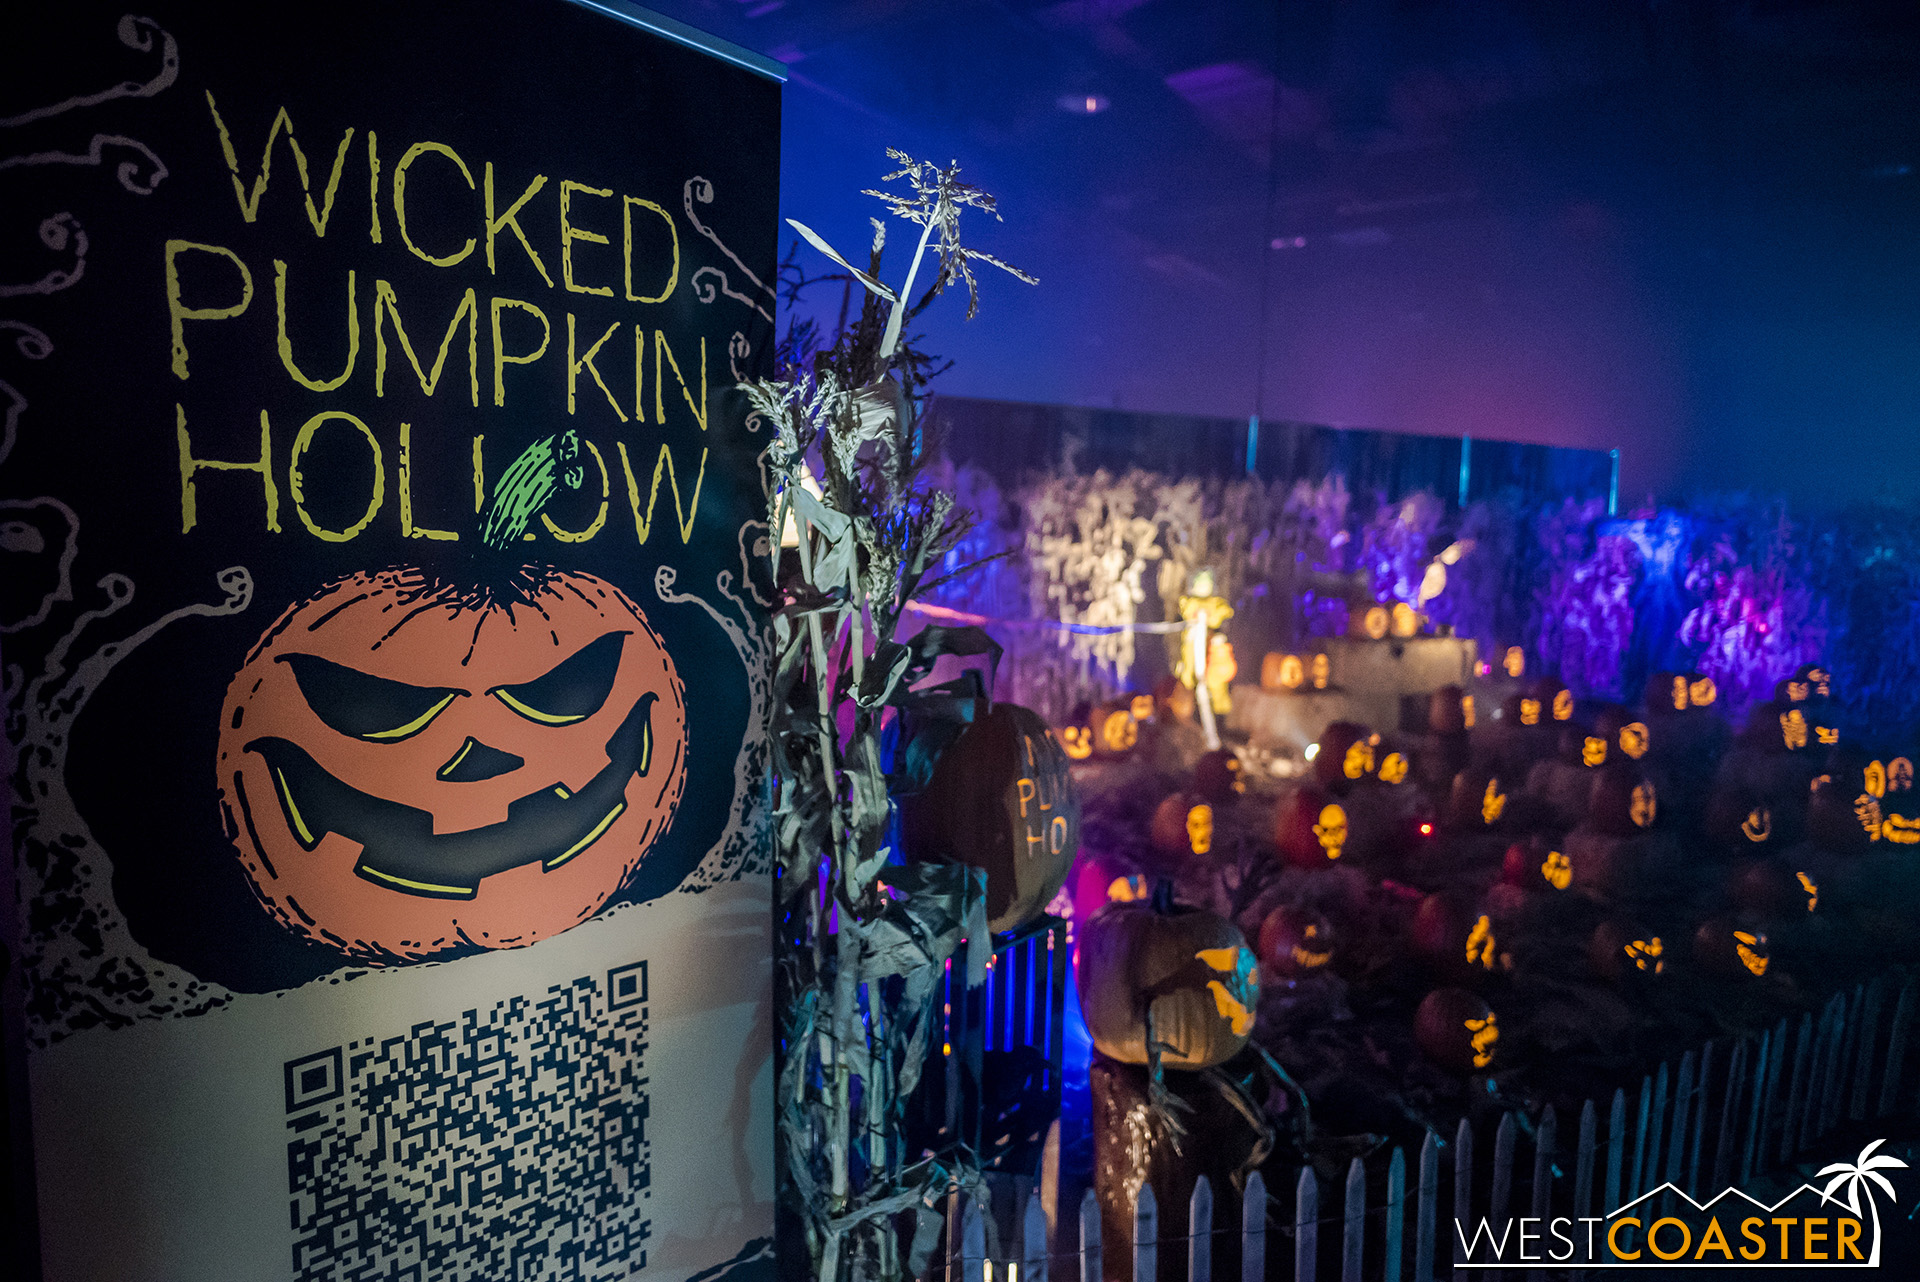 MSS-19_0809-06-WickedPumpkinHollow-0001.jpg